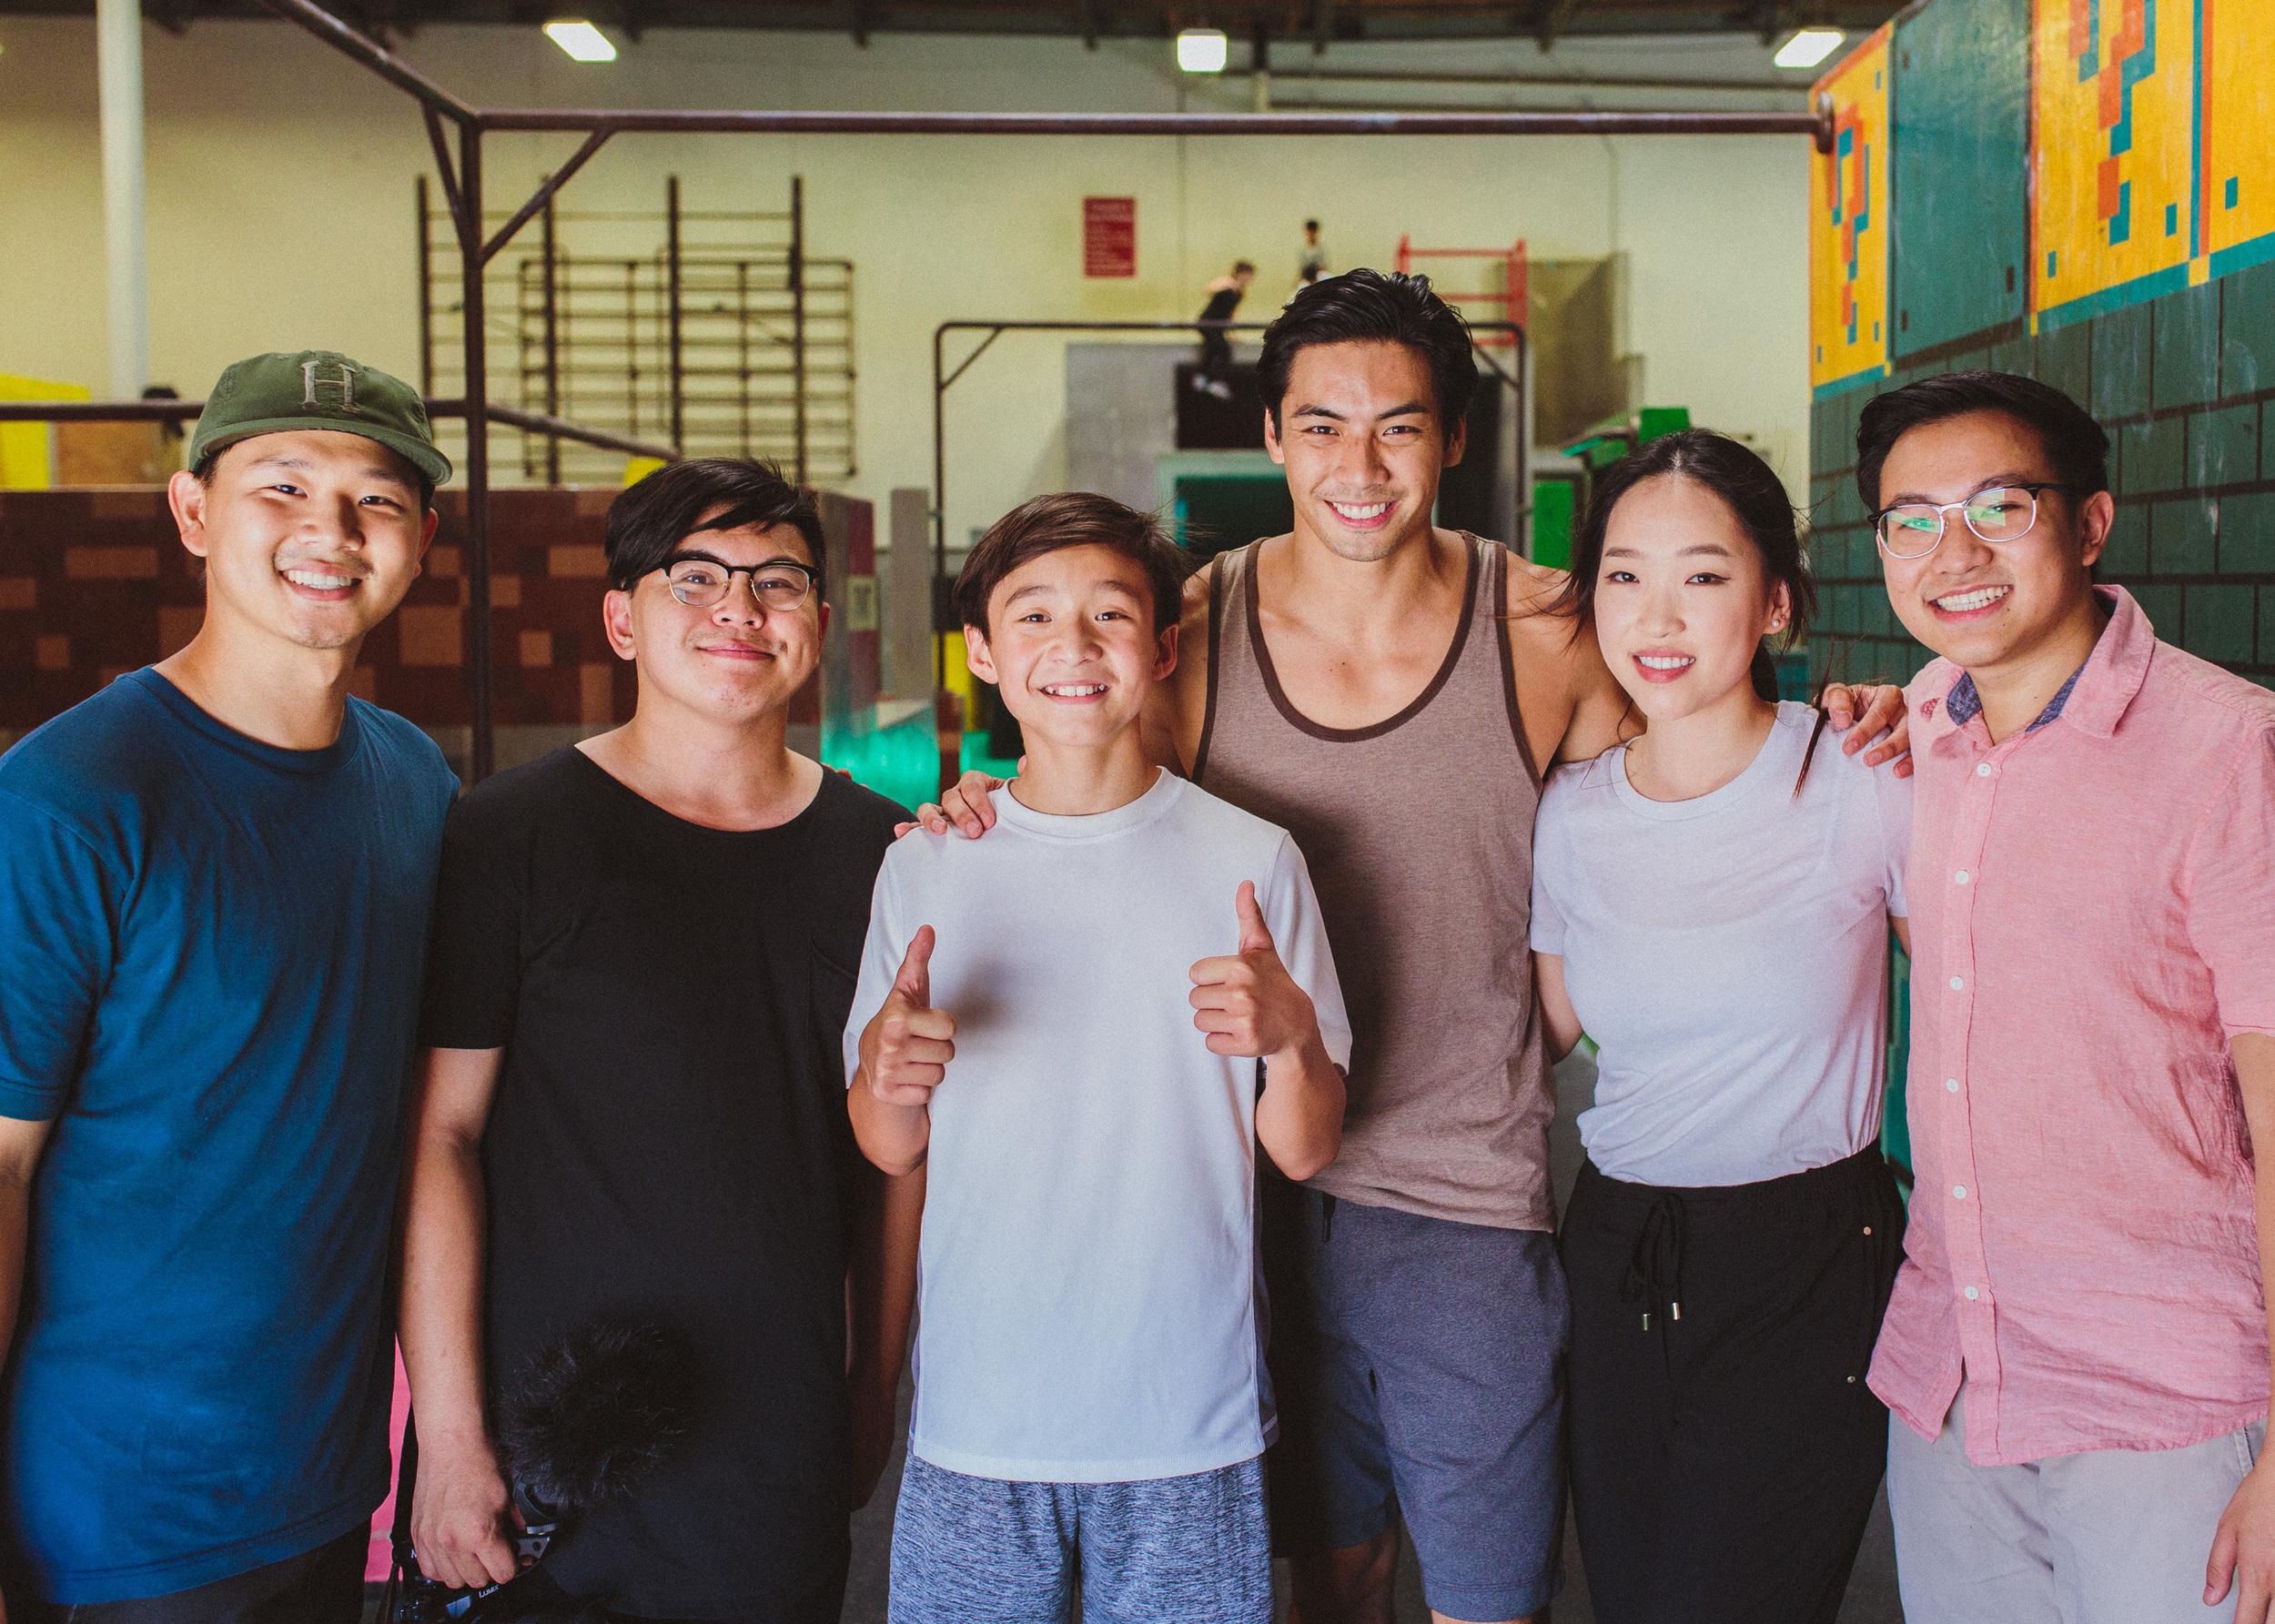 A+ crew, B- sweat.